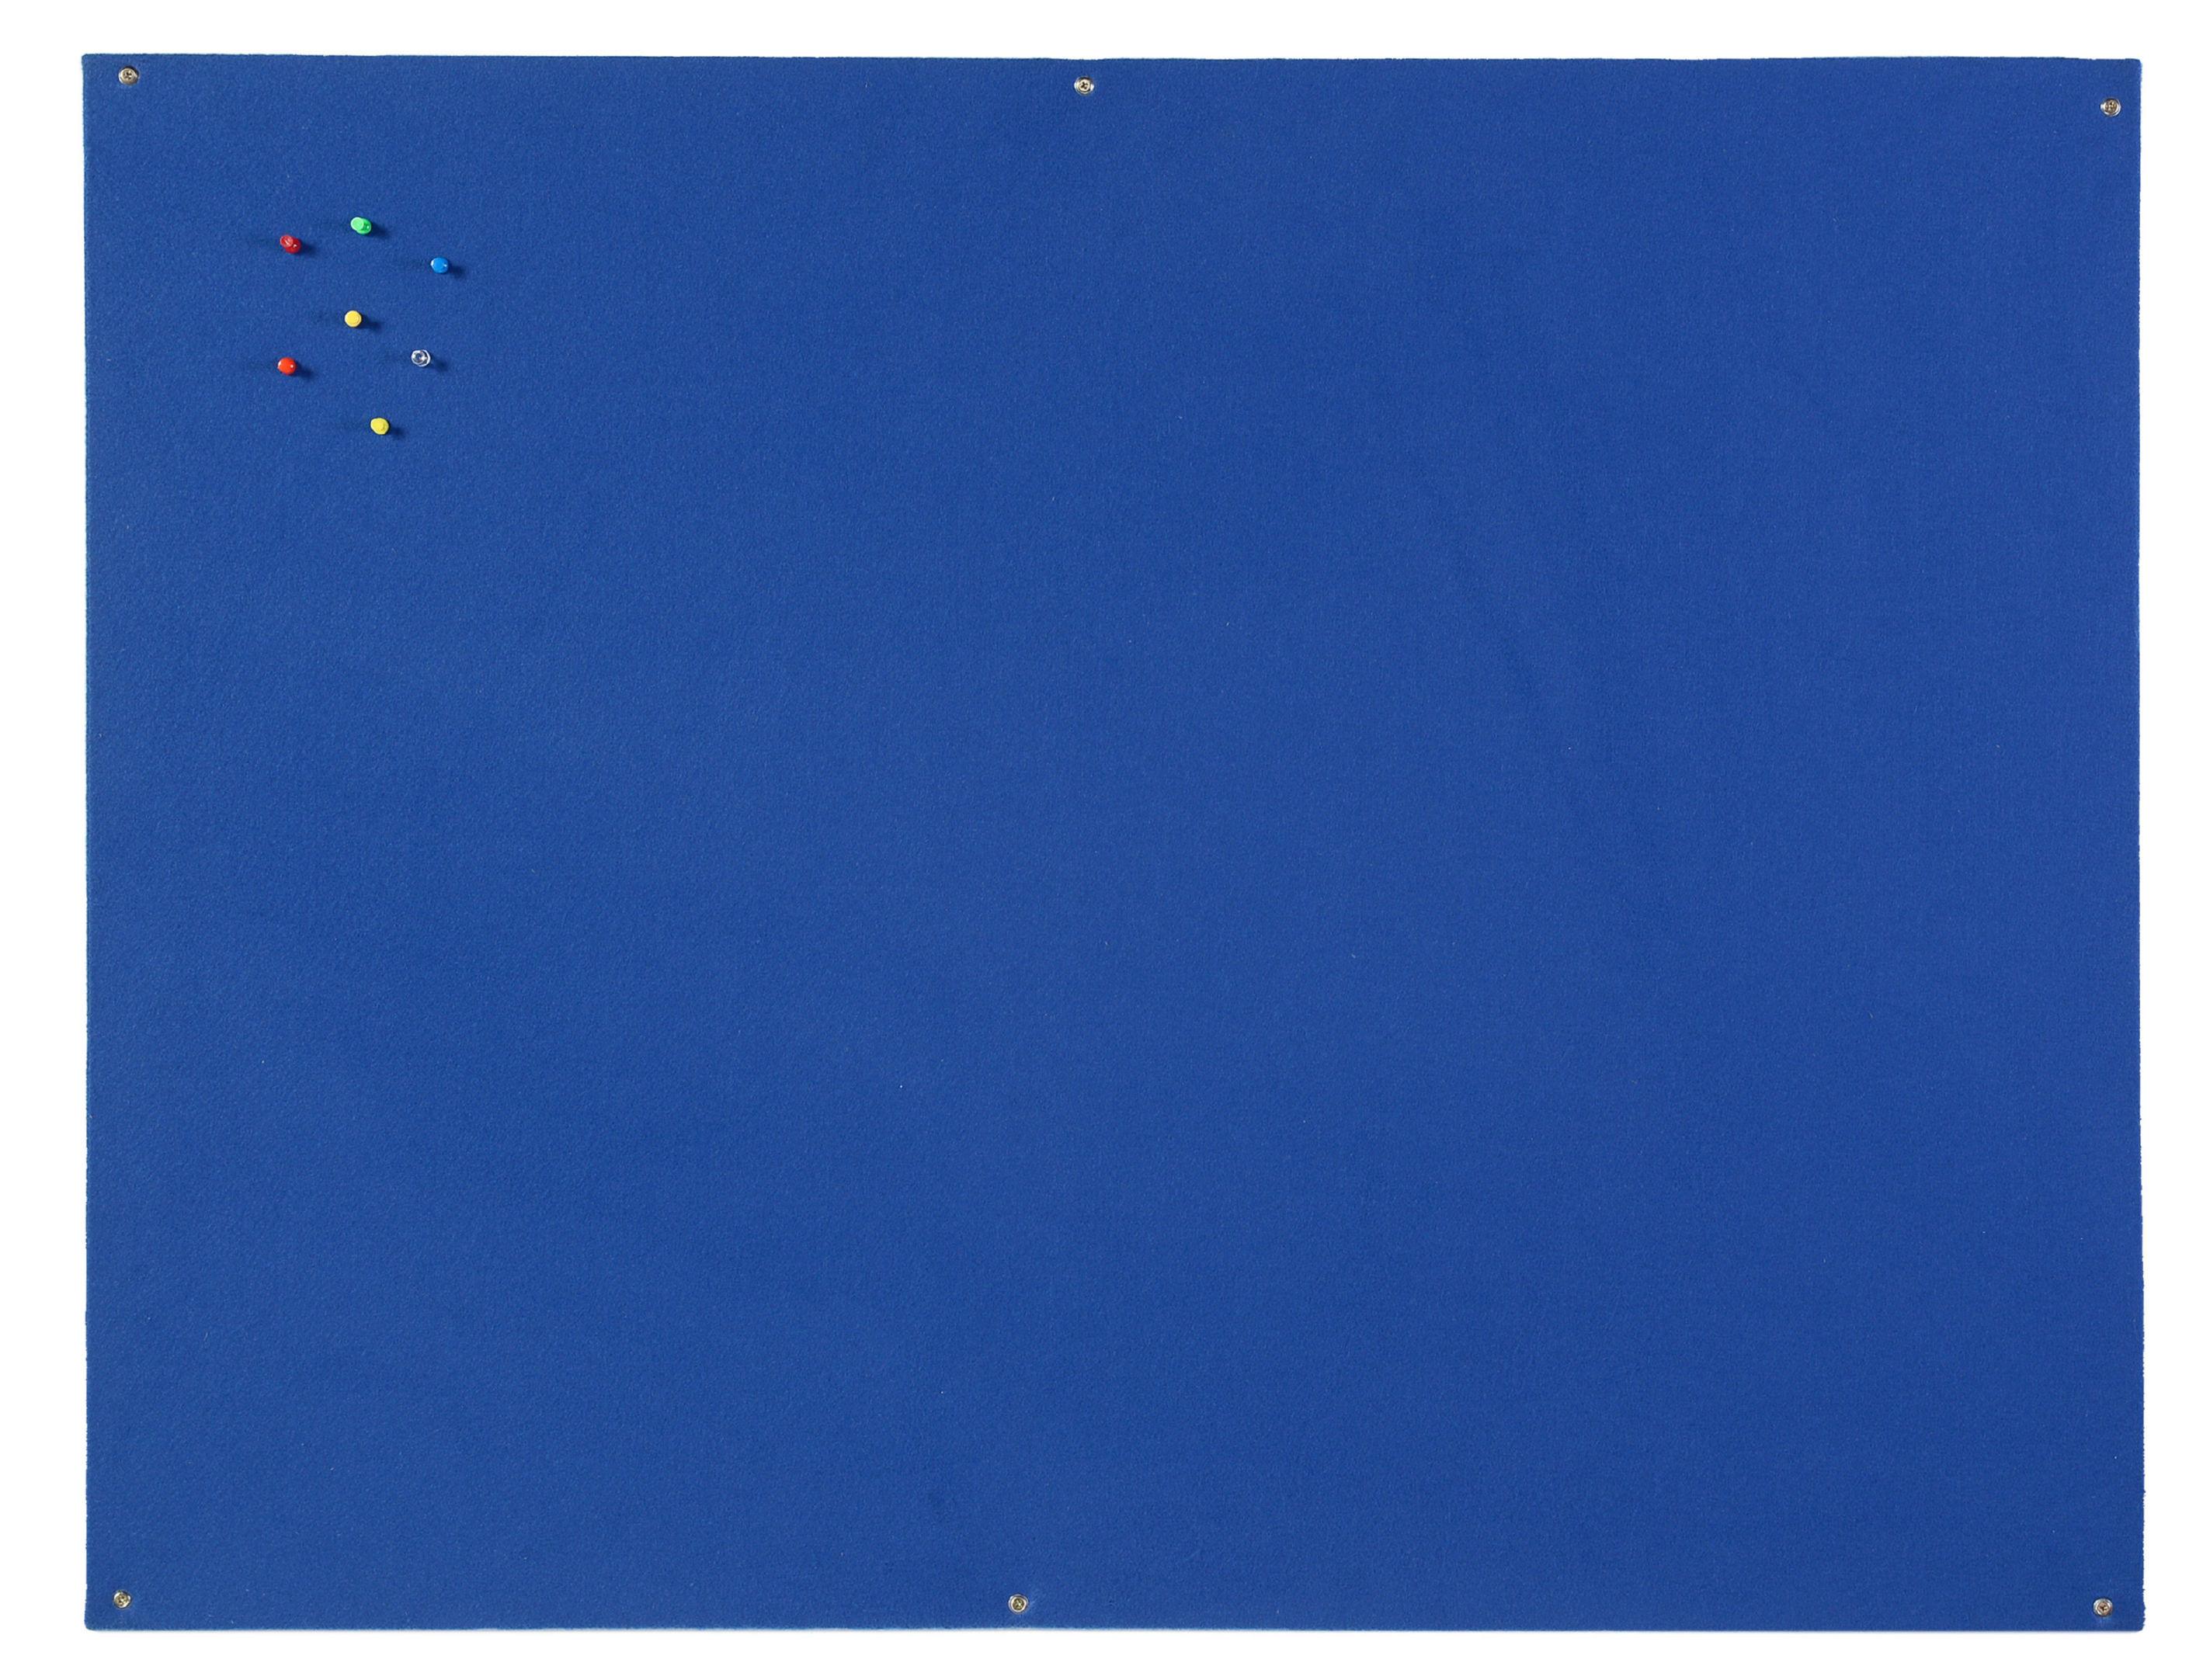 Felt Bi-Office Blue Felt Noticeboard Unframed 1200x900mm